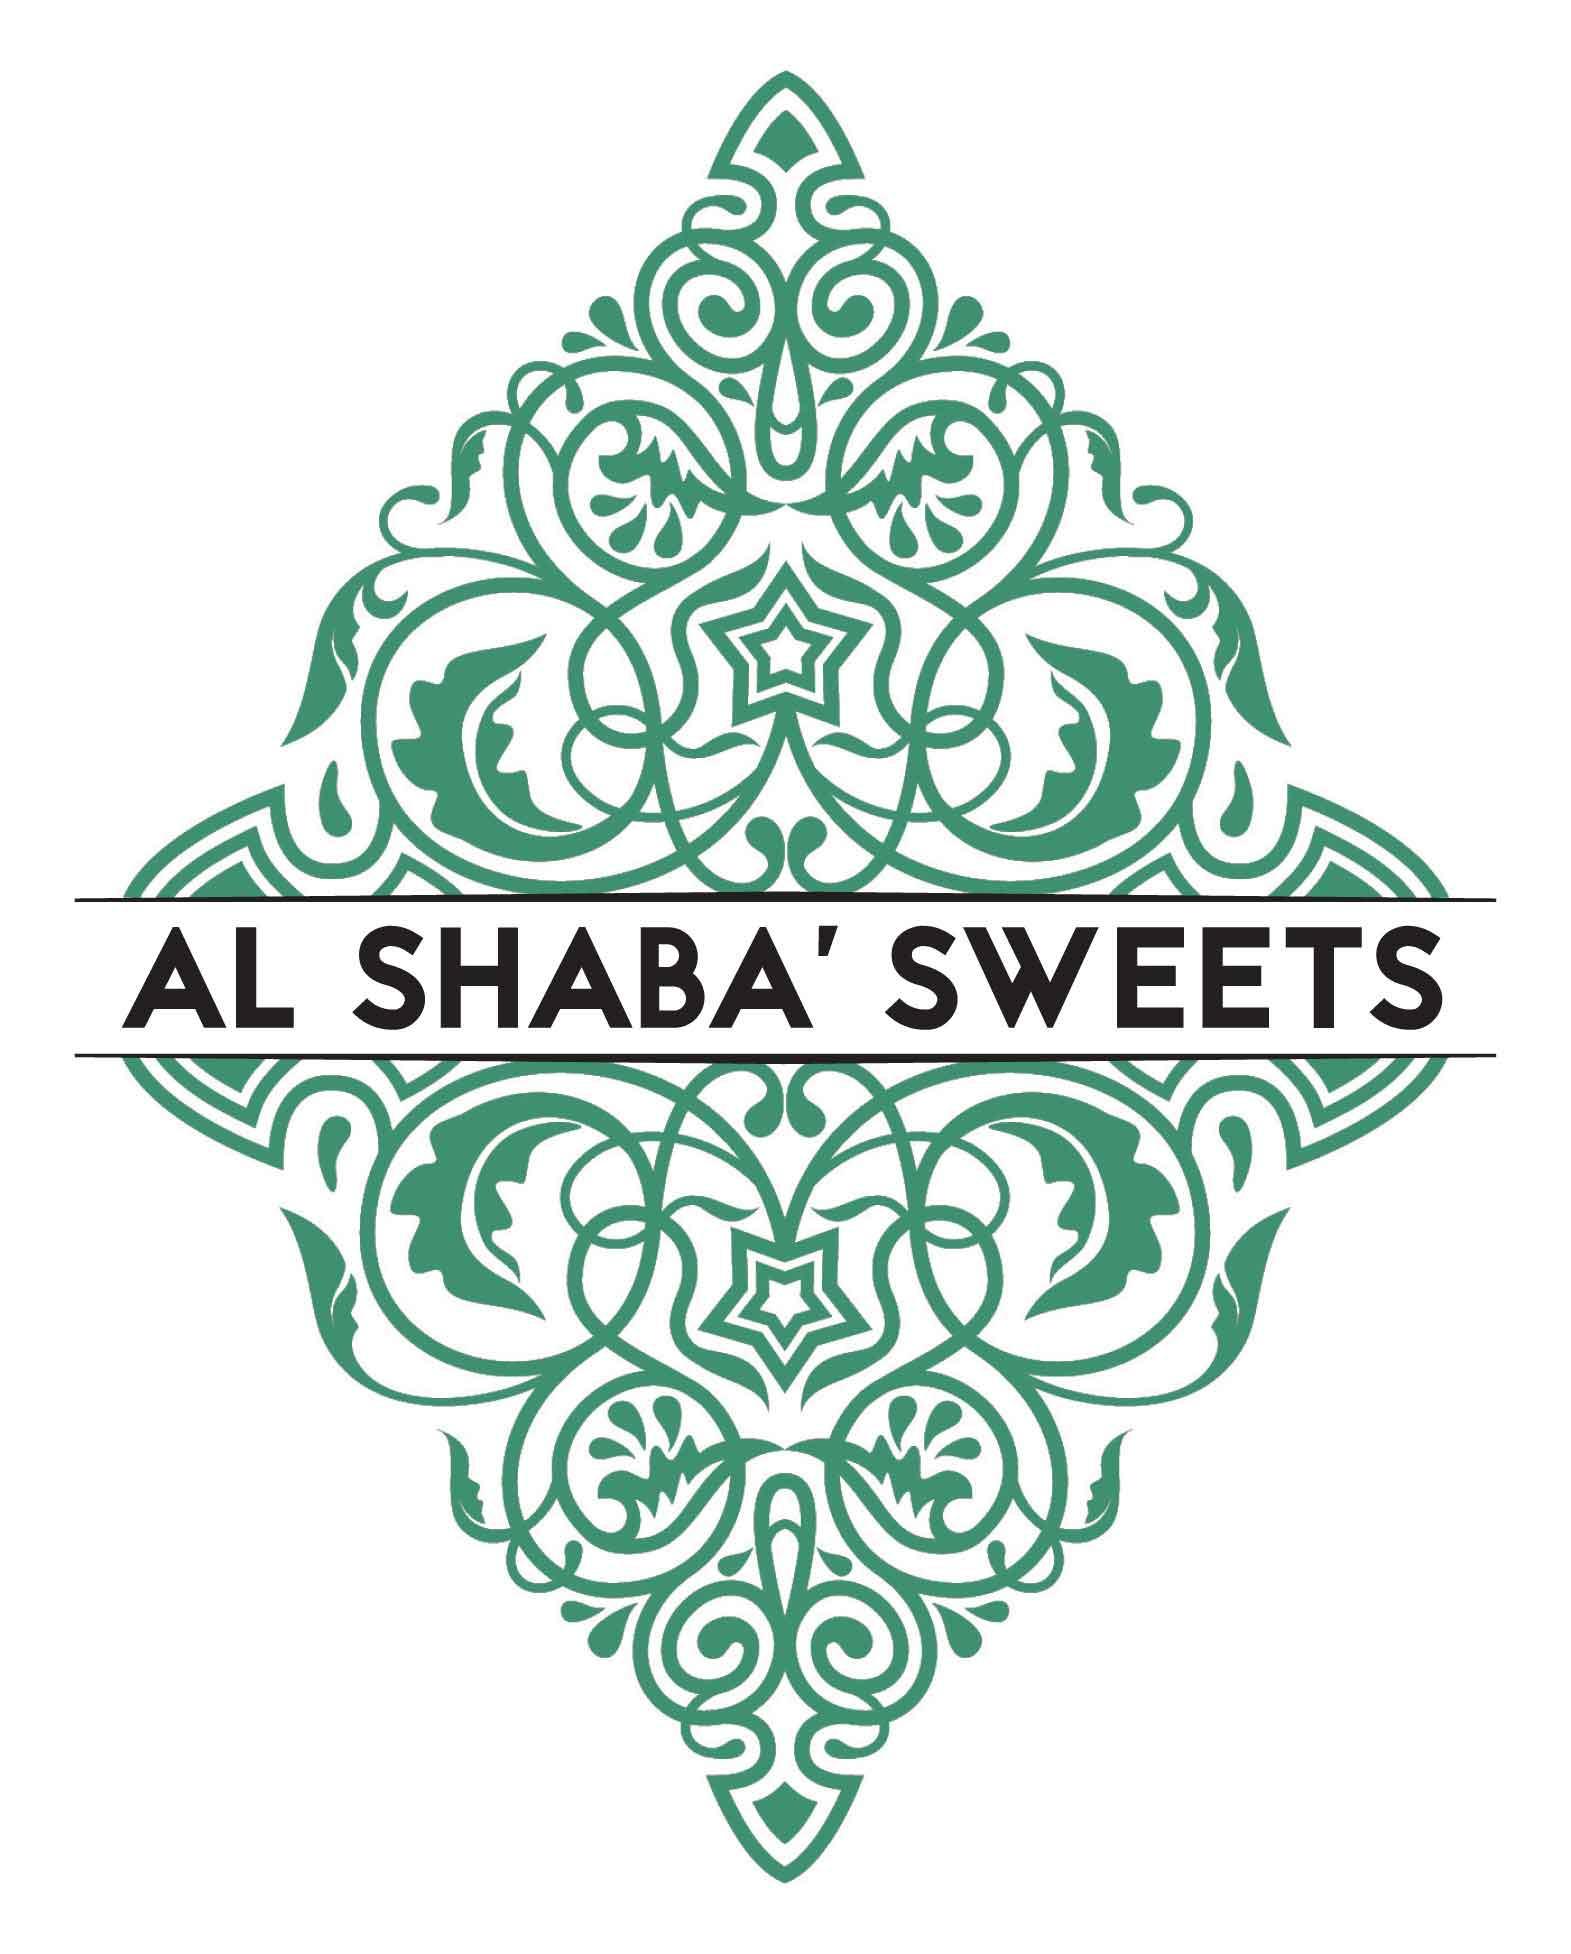 Al Shaba Sweets - Logo